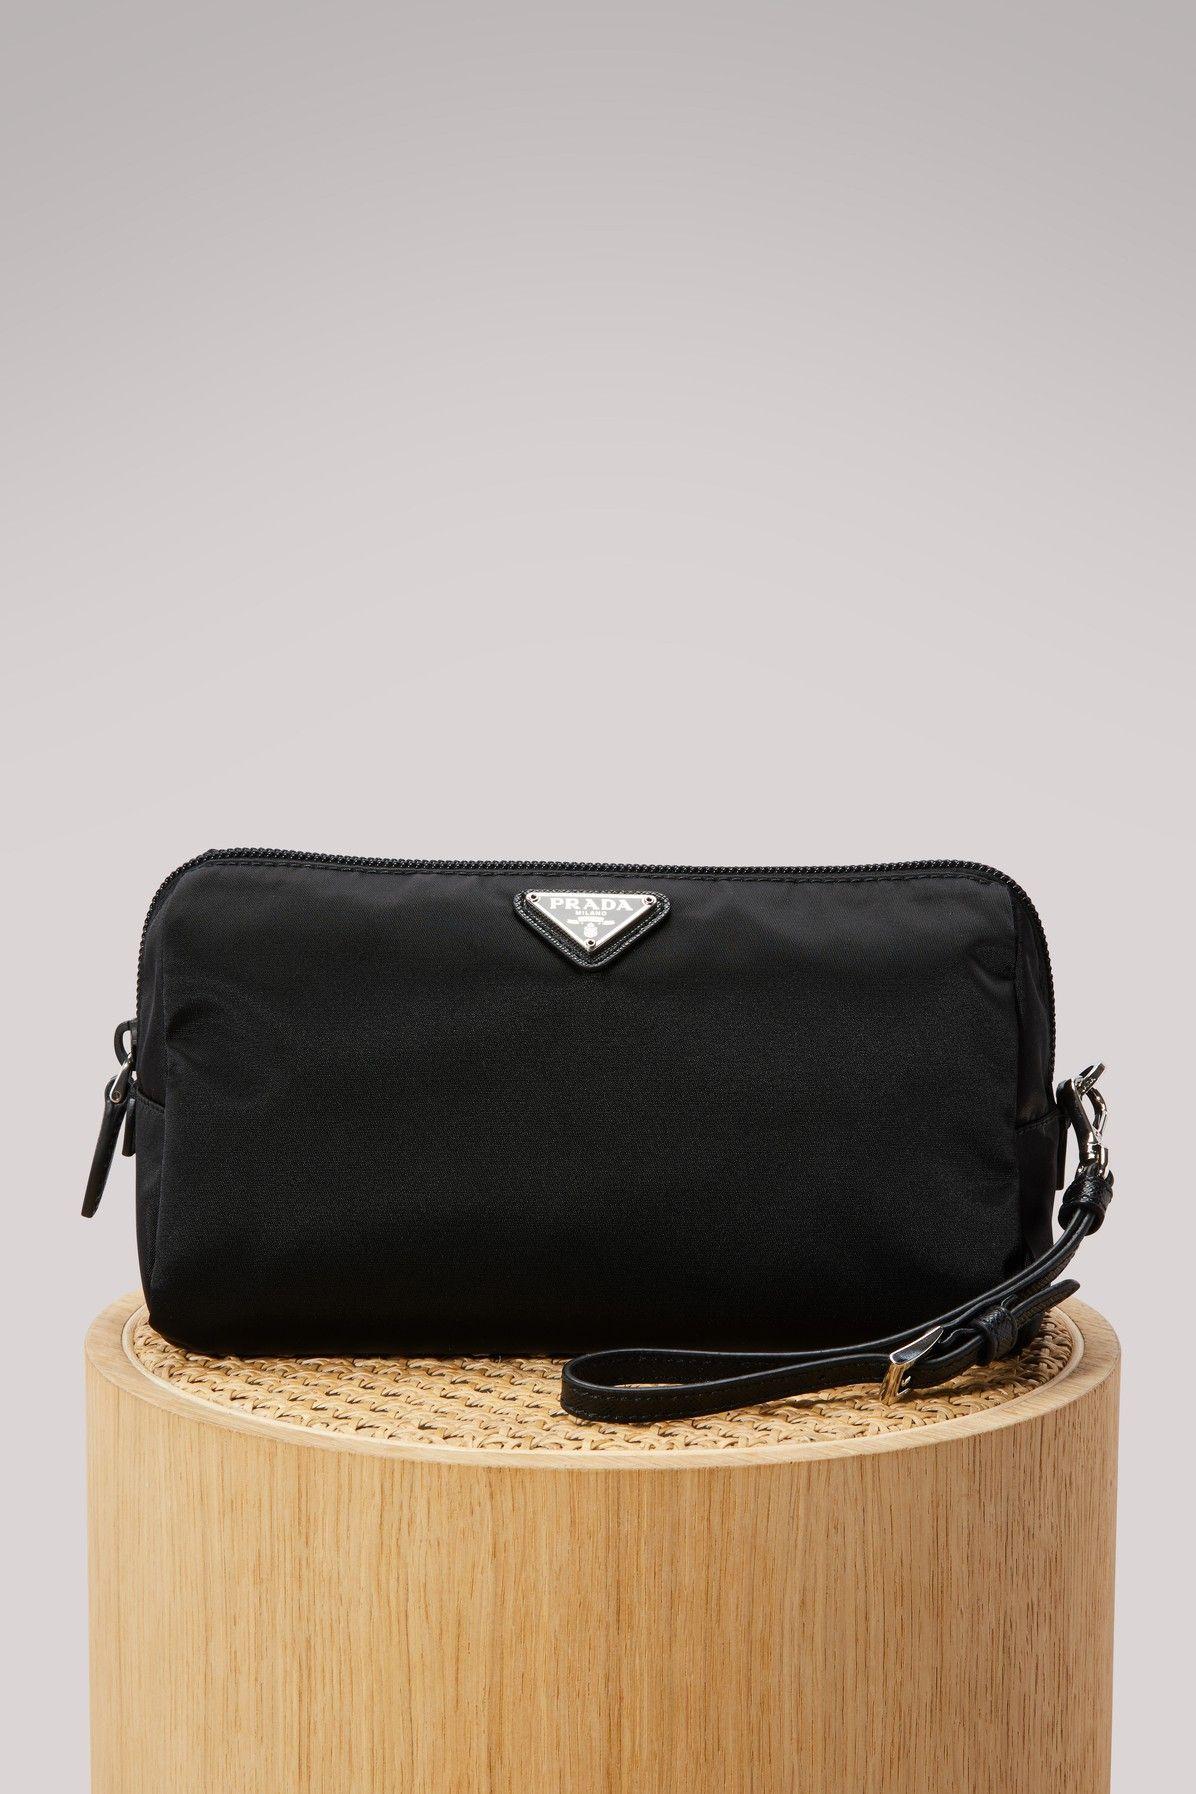 b1327a831a4098 PRADA NYLON CLUTCH BAG. #prada #bags #clutch #nylon #hand bags ...